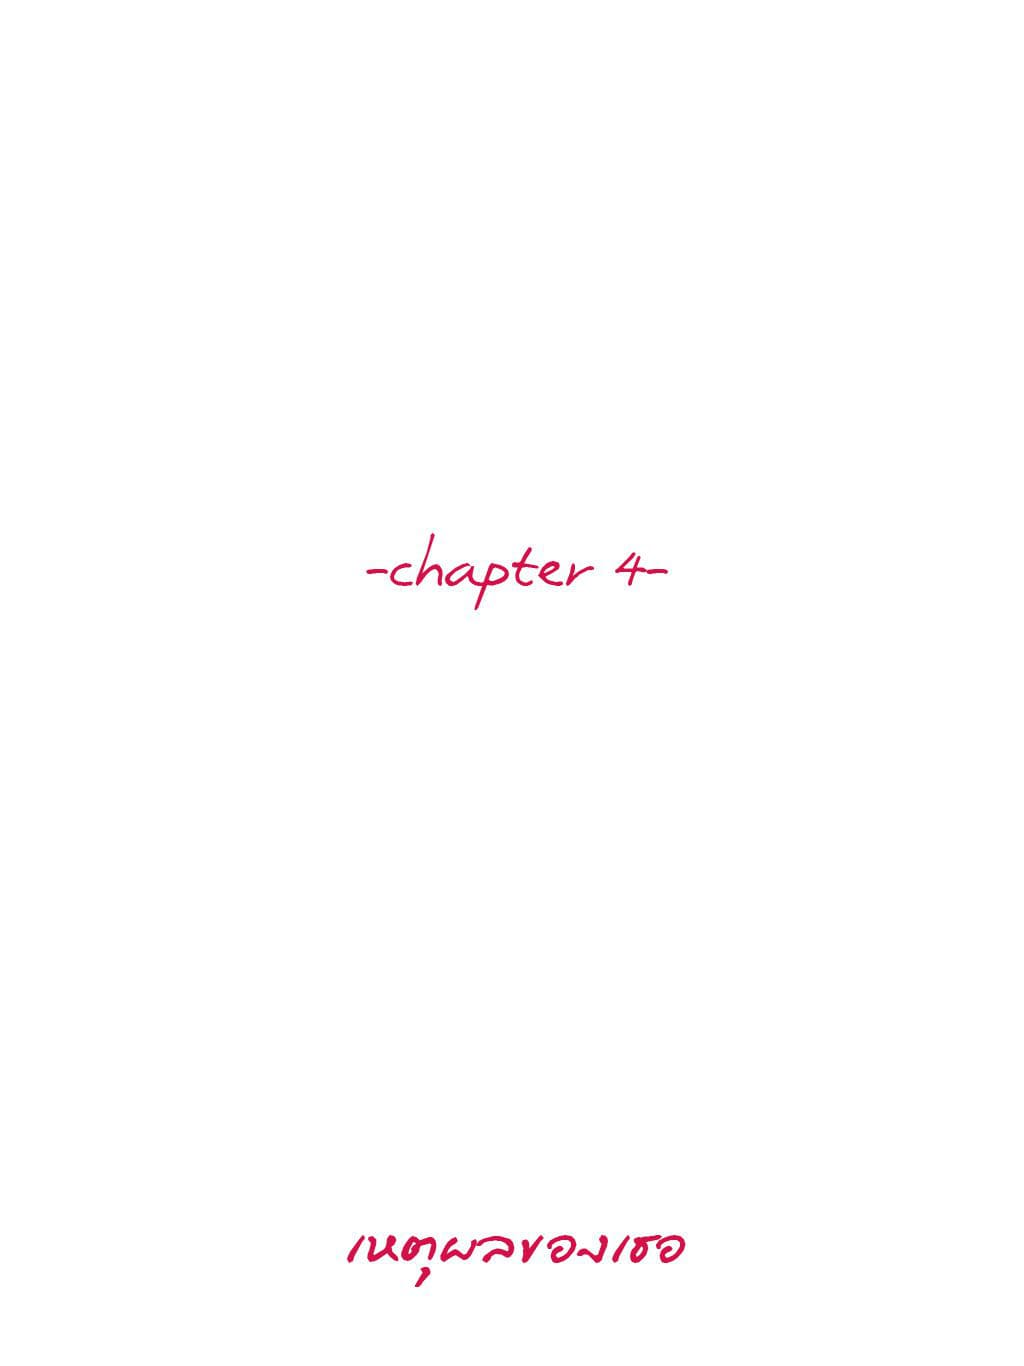 chapter 4 - เหตุผลของเธอ